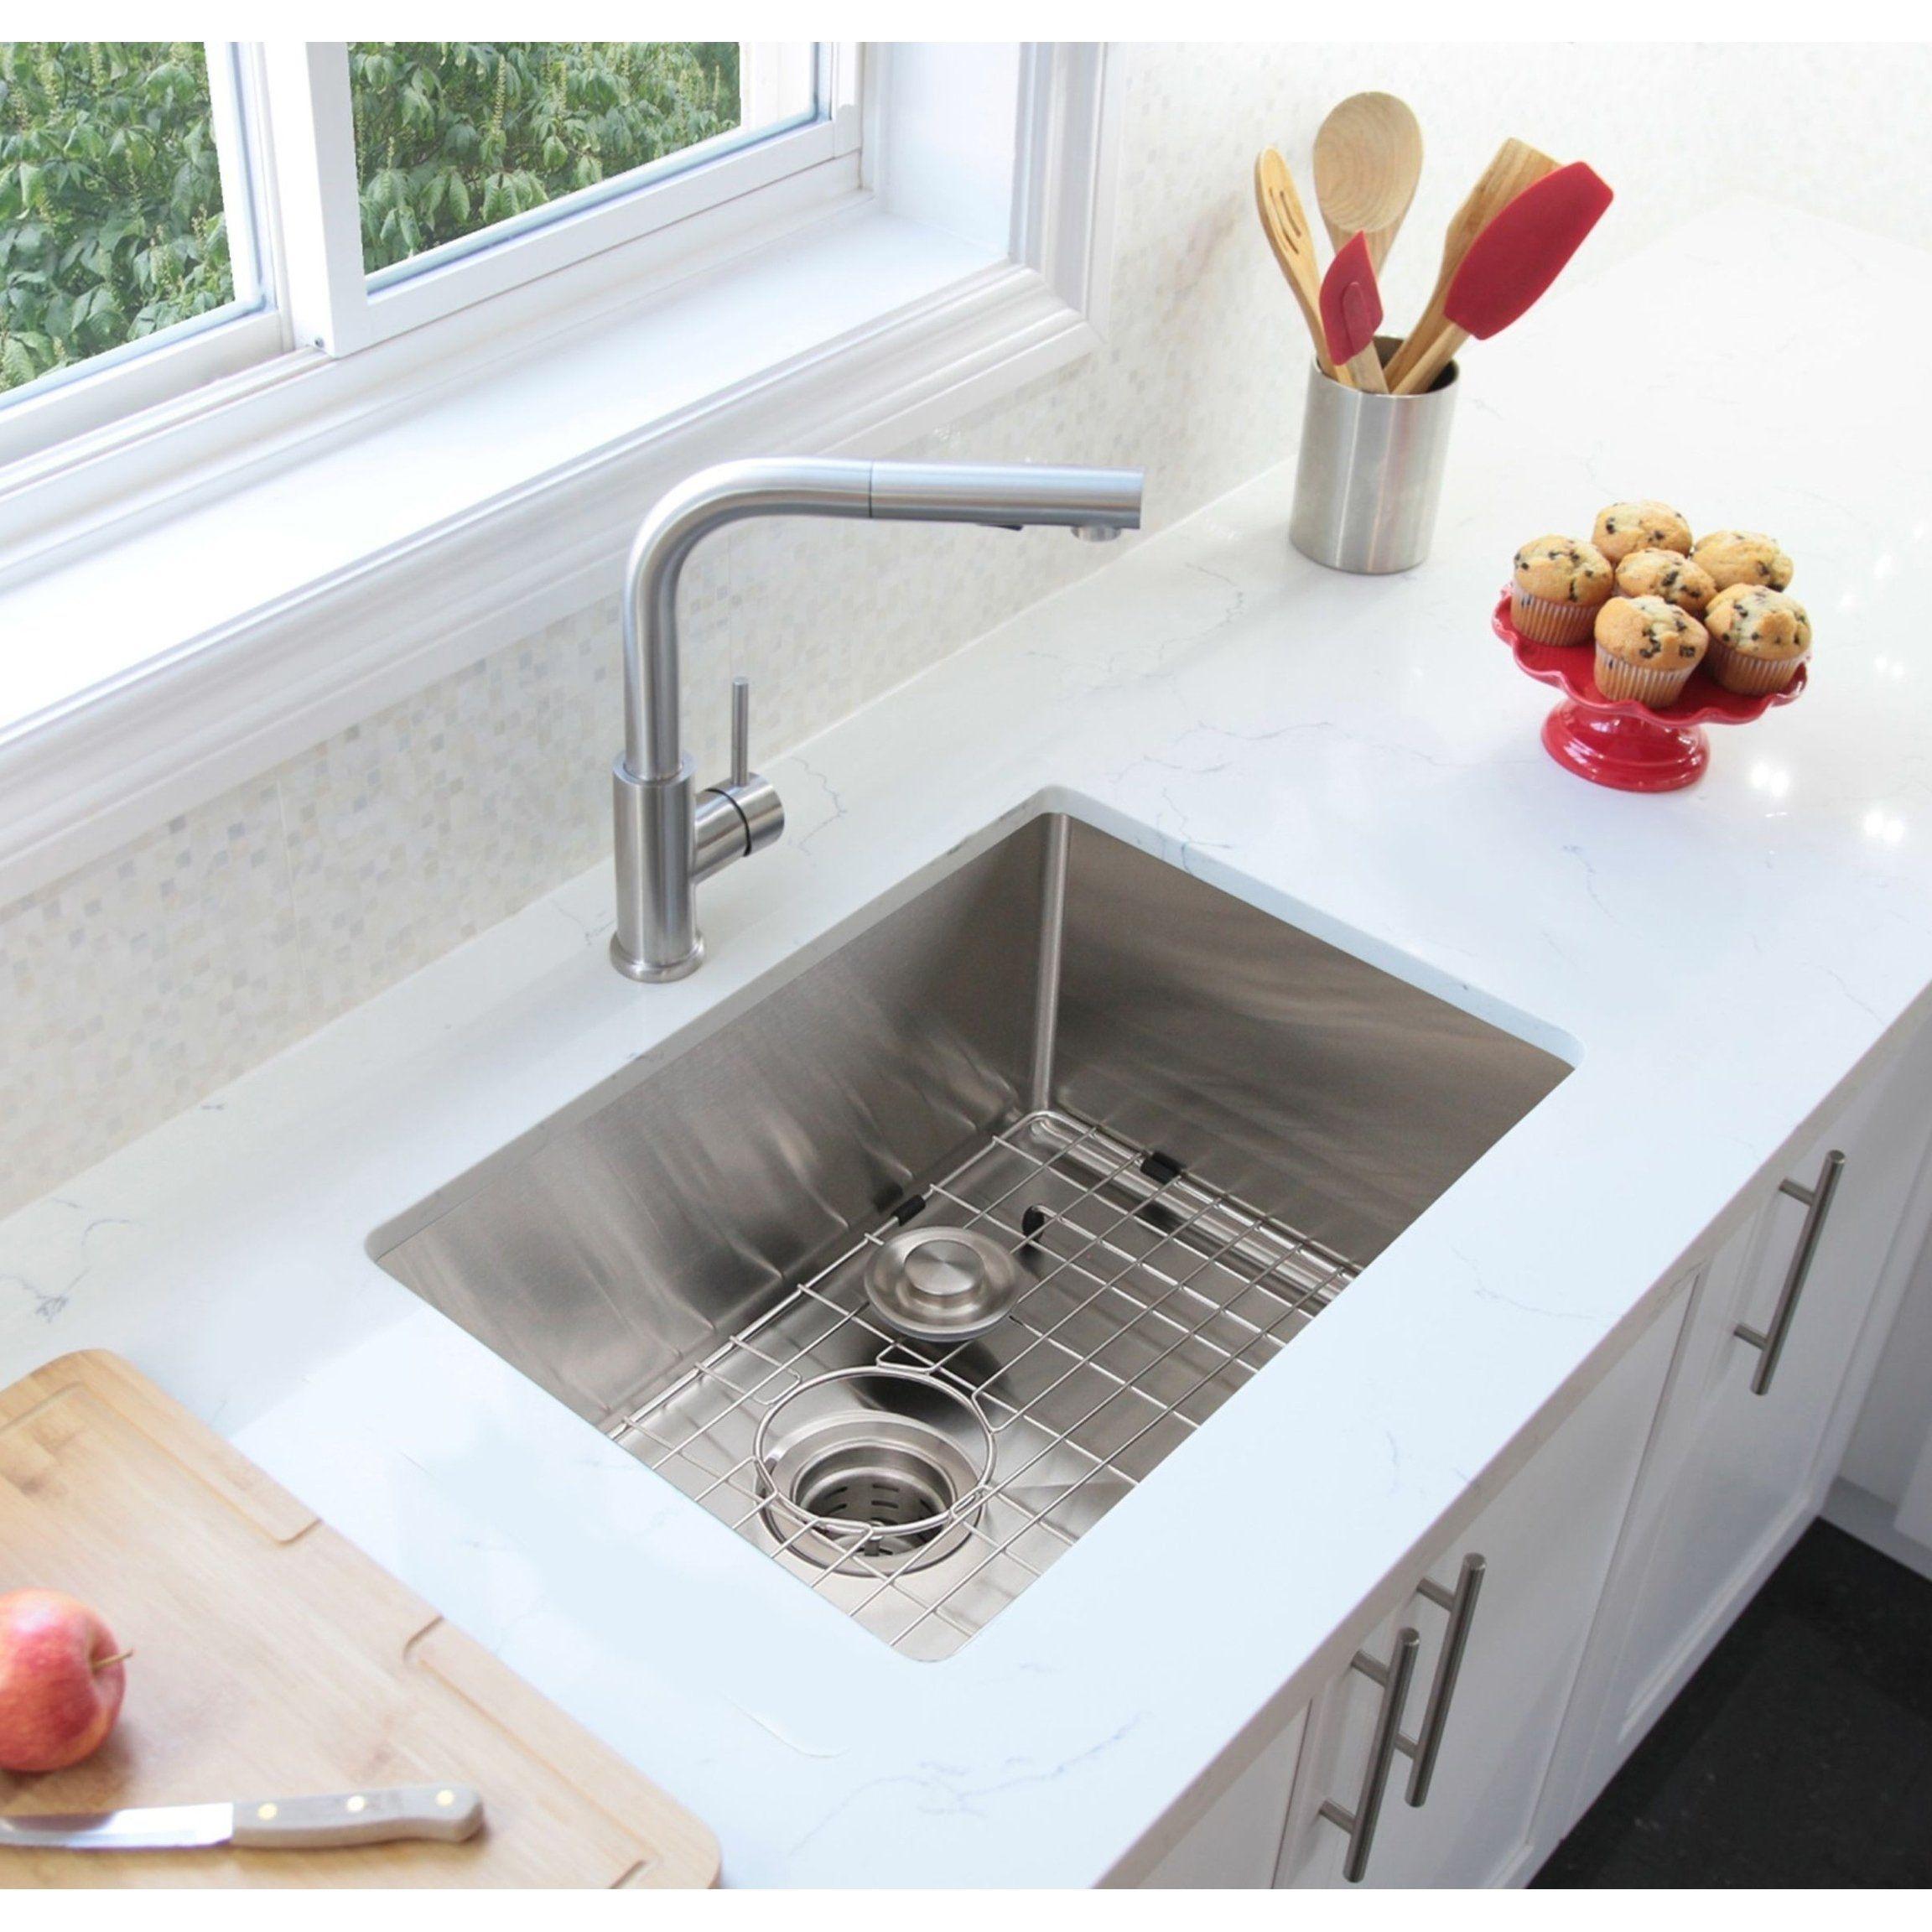 28 Undermount Single Bowl Kitchen Sink 16g Stainless Steel With